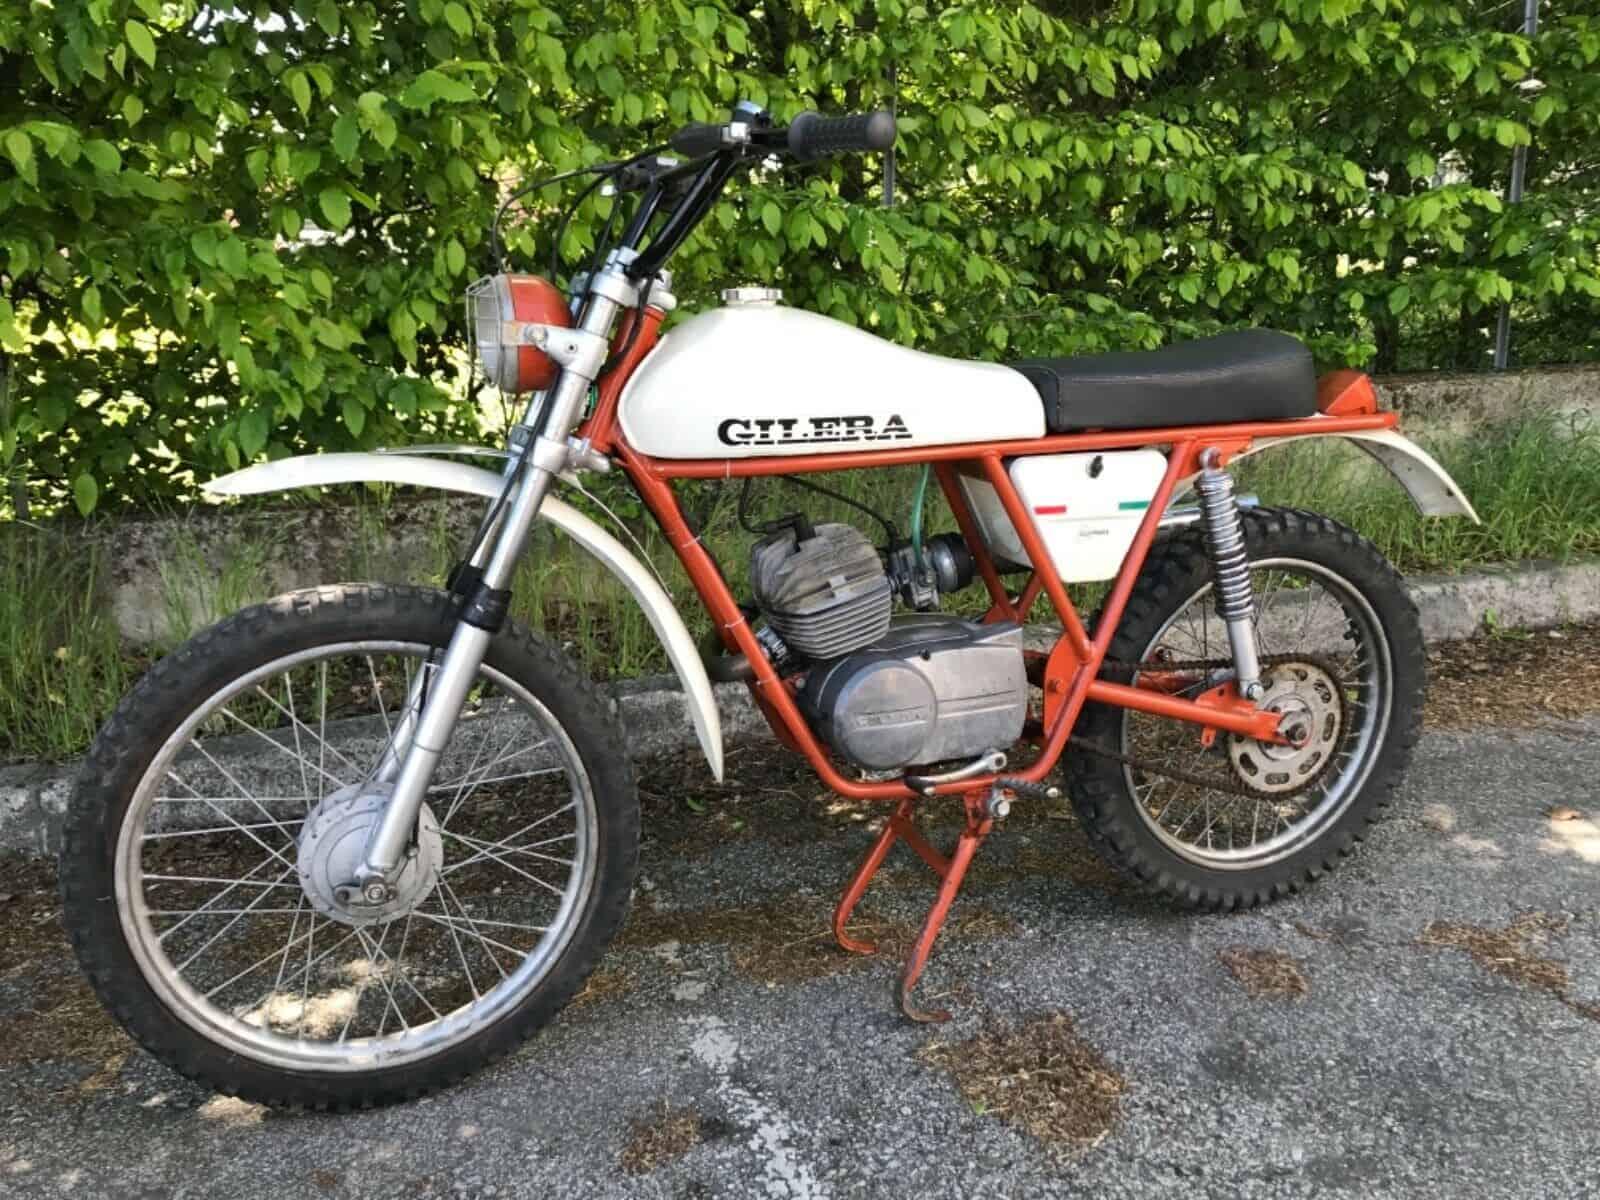 GILERA TRIAL 5V 50 SPORTS 1973